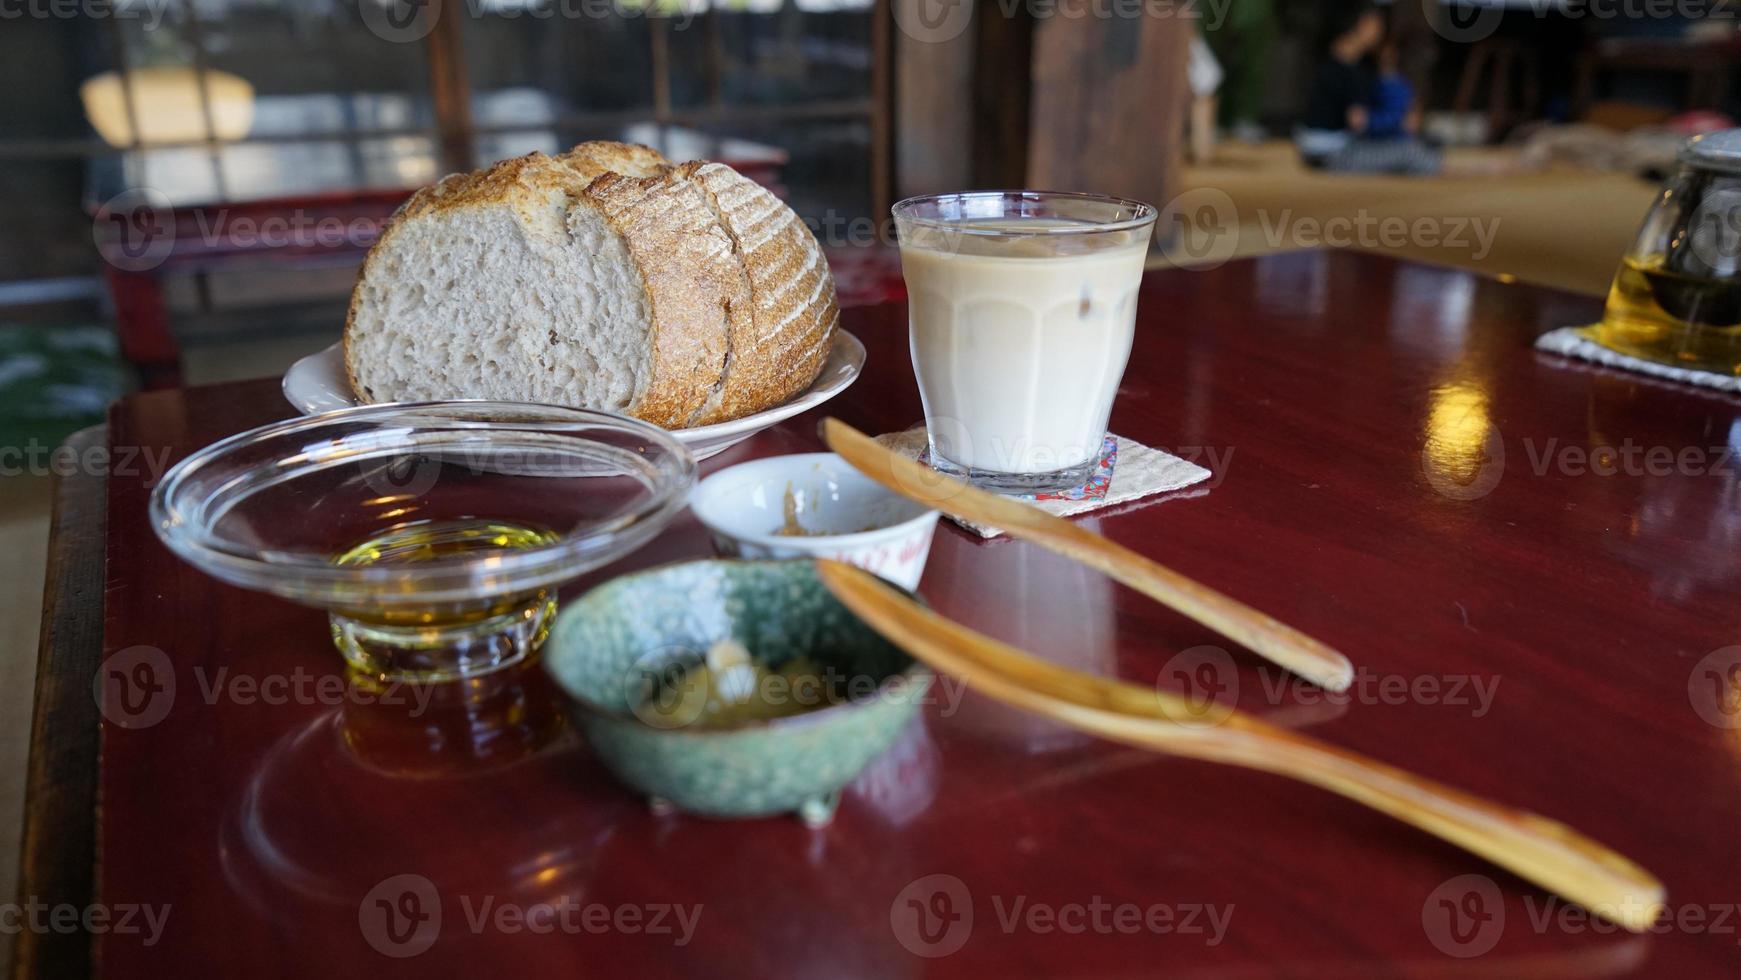 campagne och café au lait med doppsås foto